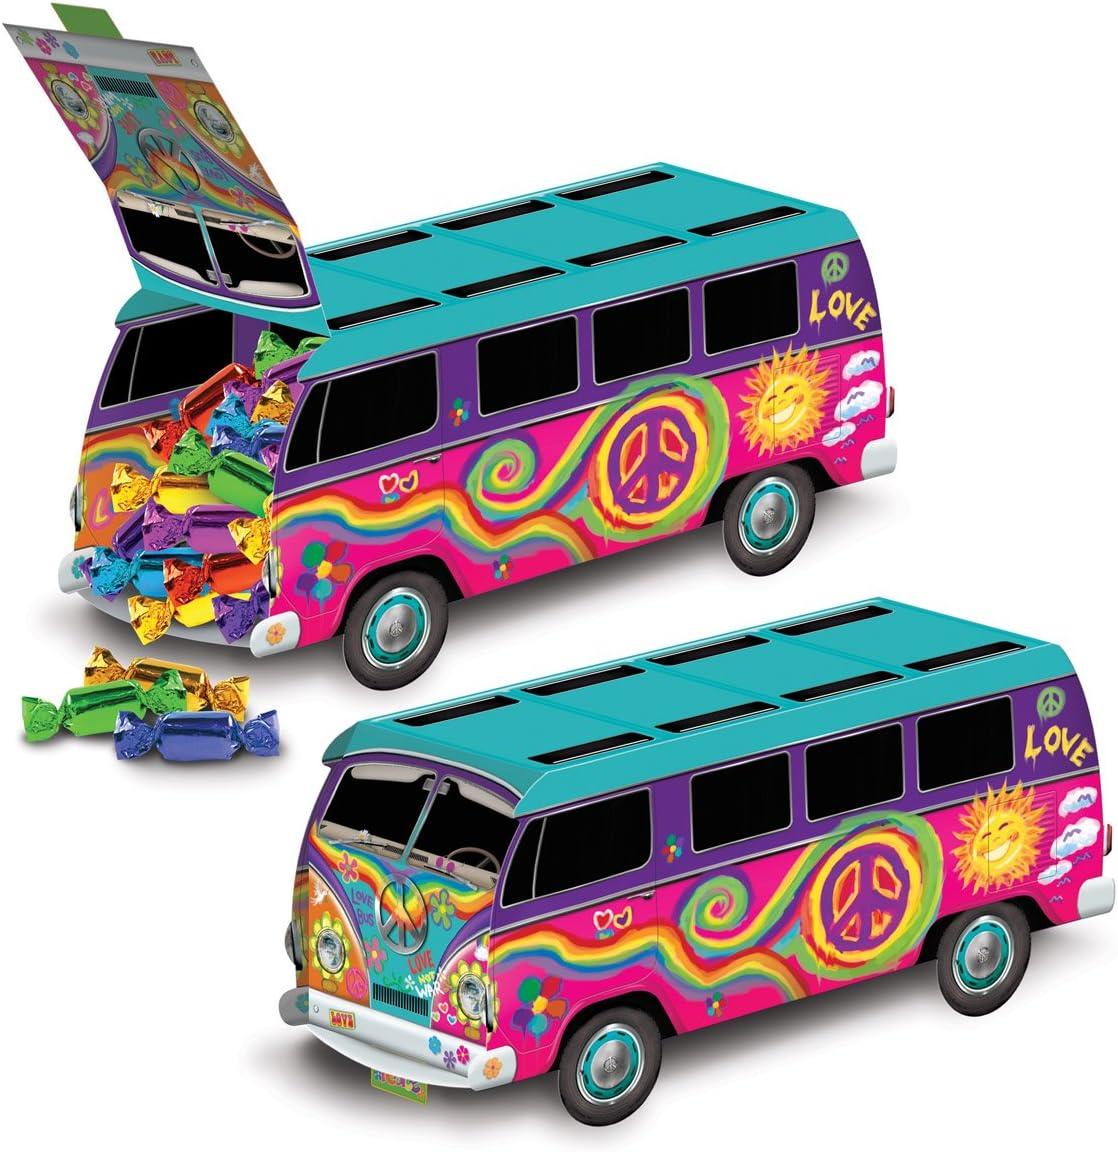 "Beistle 3-D 60's Bus Centerpiece, 9.75"", Multicolored"